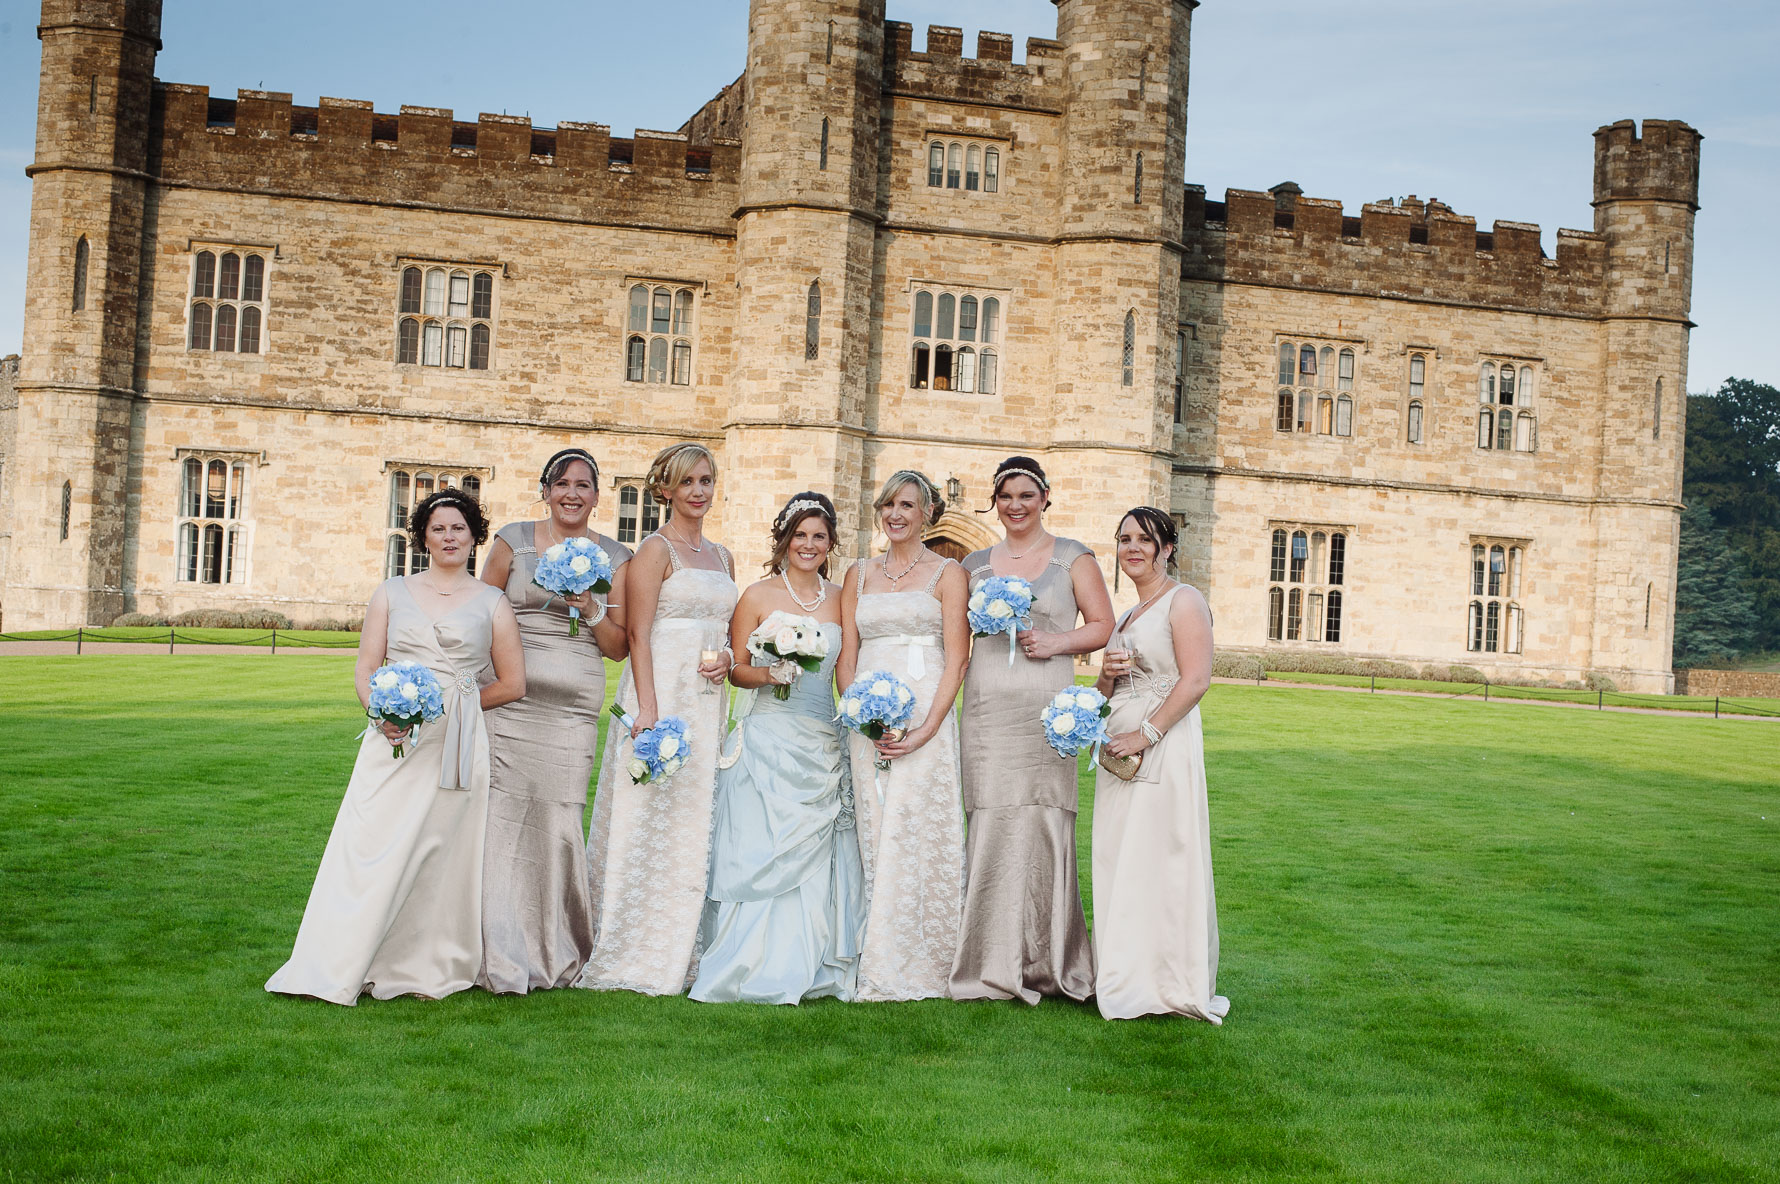 Leeds Castle Wedding31-20140919 0873